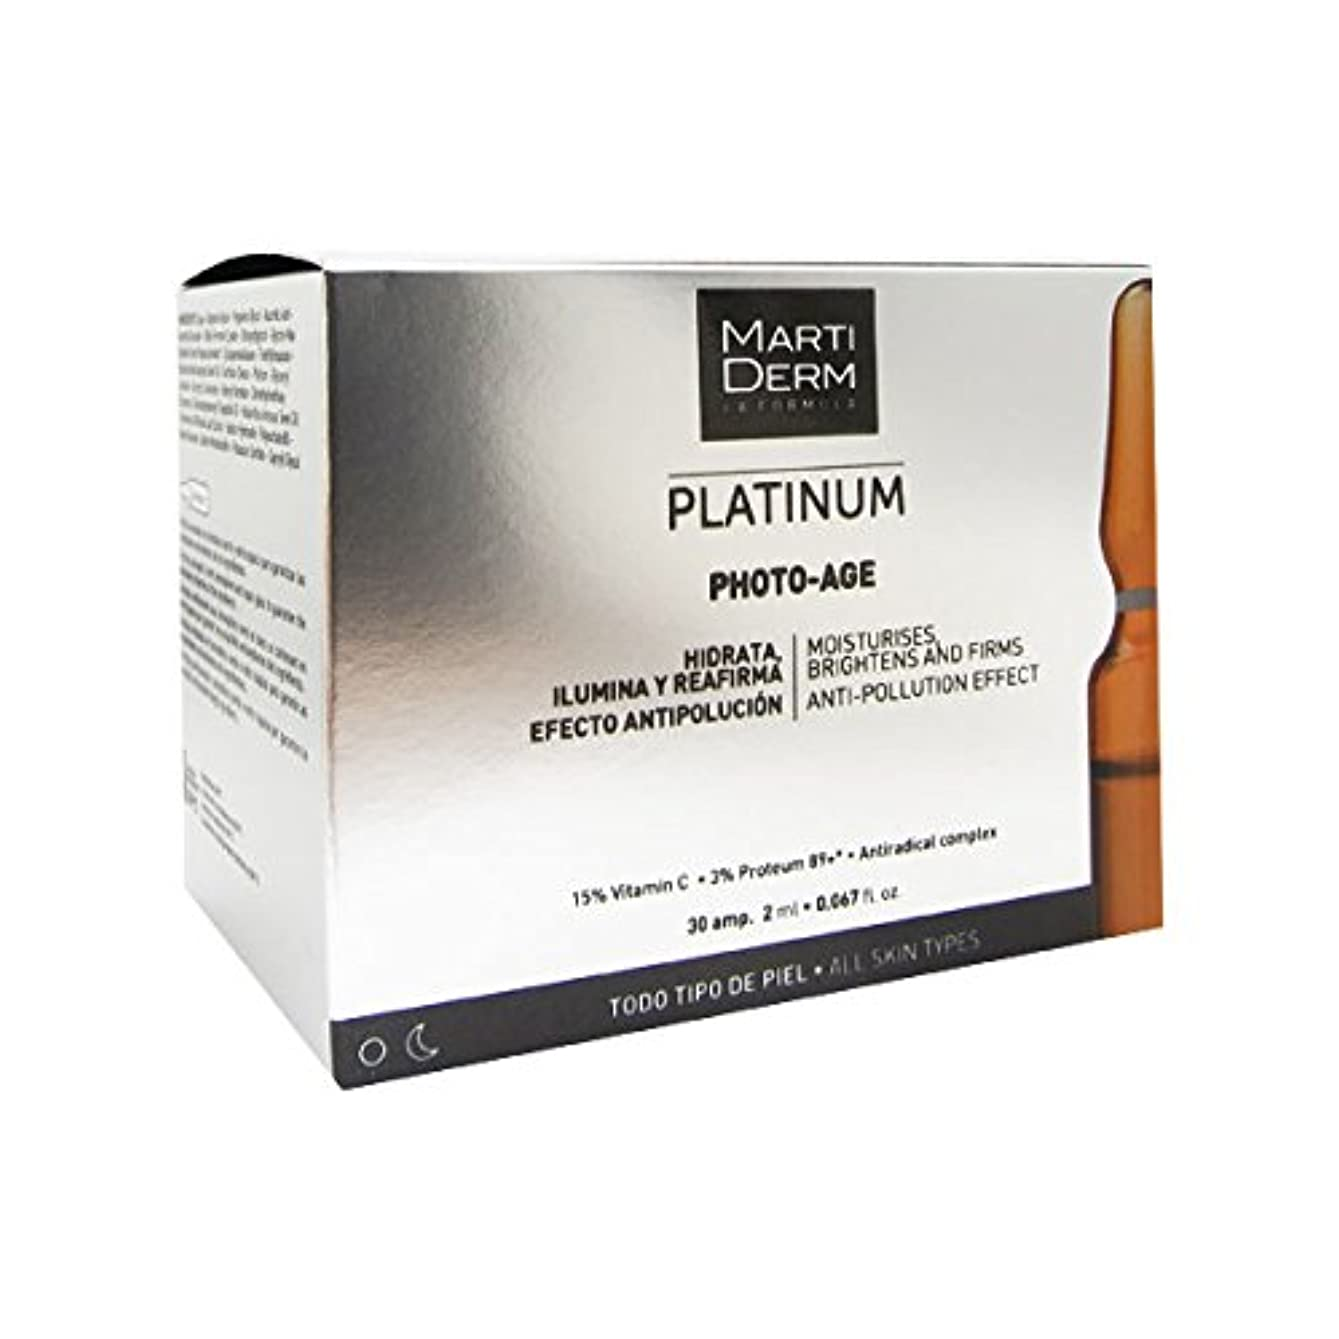 哲学的欺く西部Martiderm Platinum Photo-age 30ampx2ml [並行輸入品]